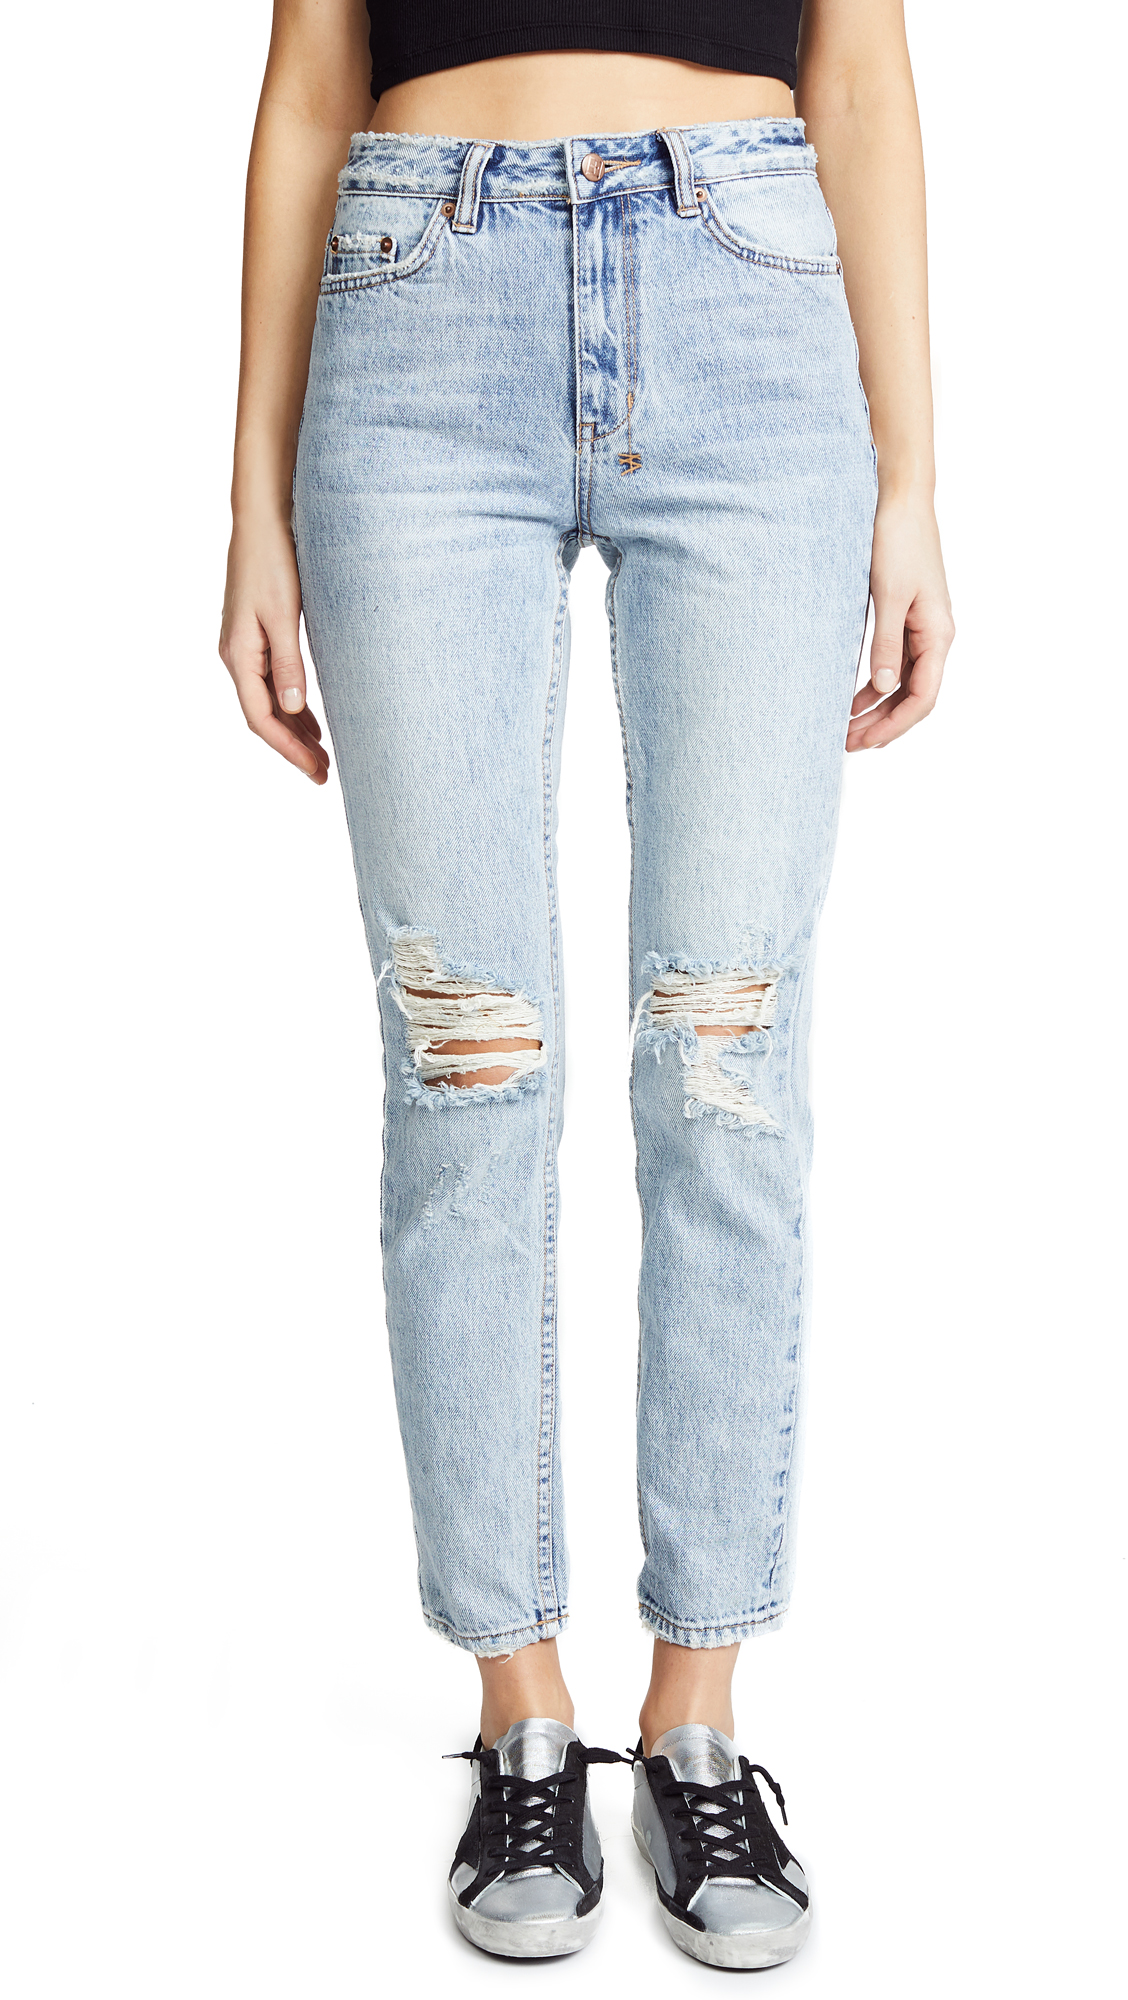 Ksubi The Slim Pin Jeans